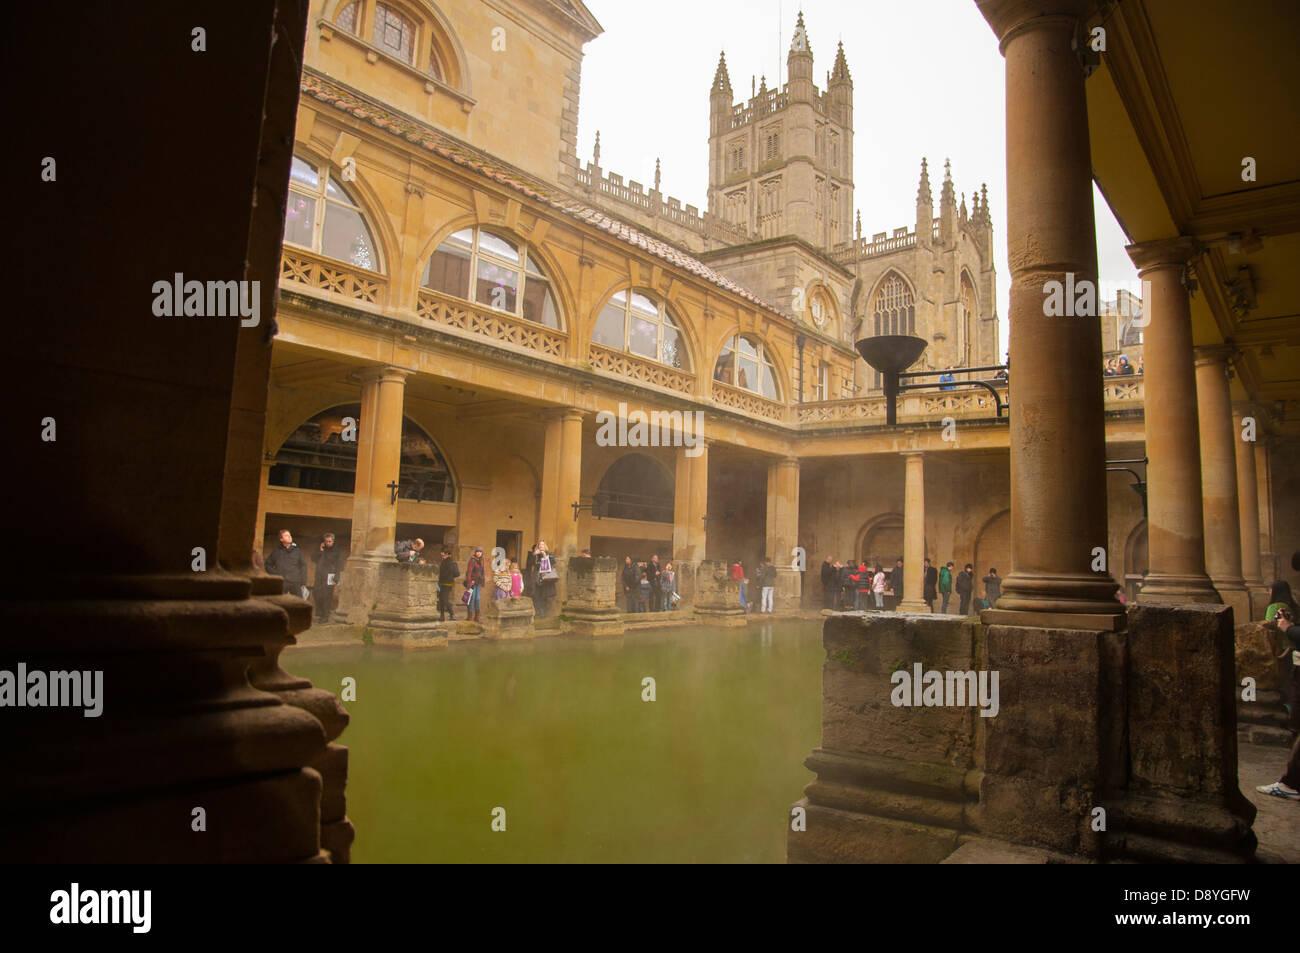 View of the Roman baths, Bath, Somerset, England - Stock Image